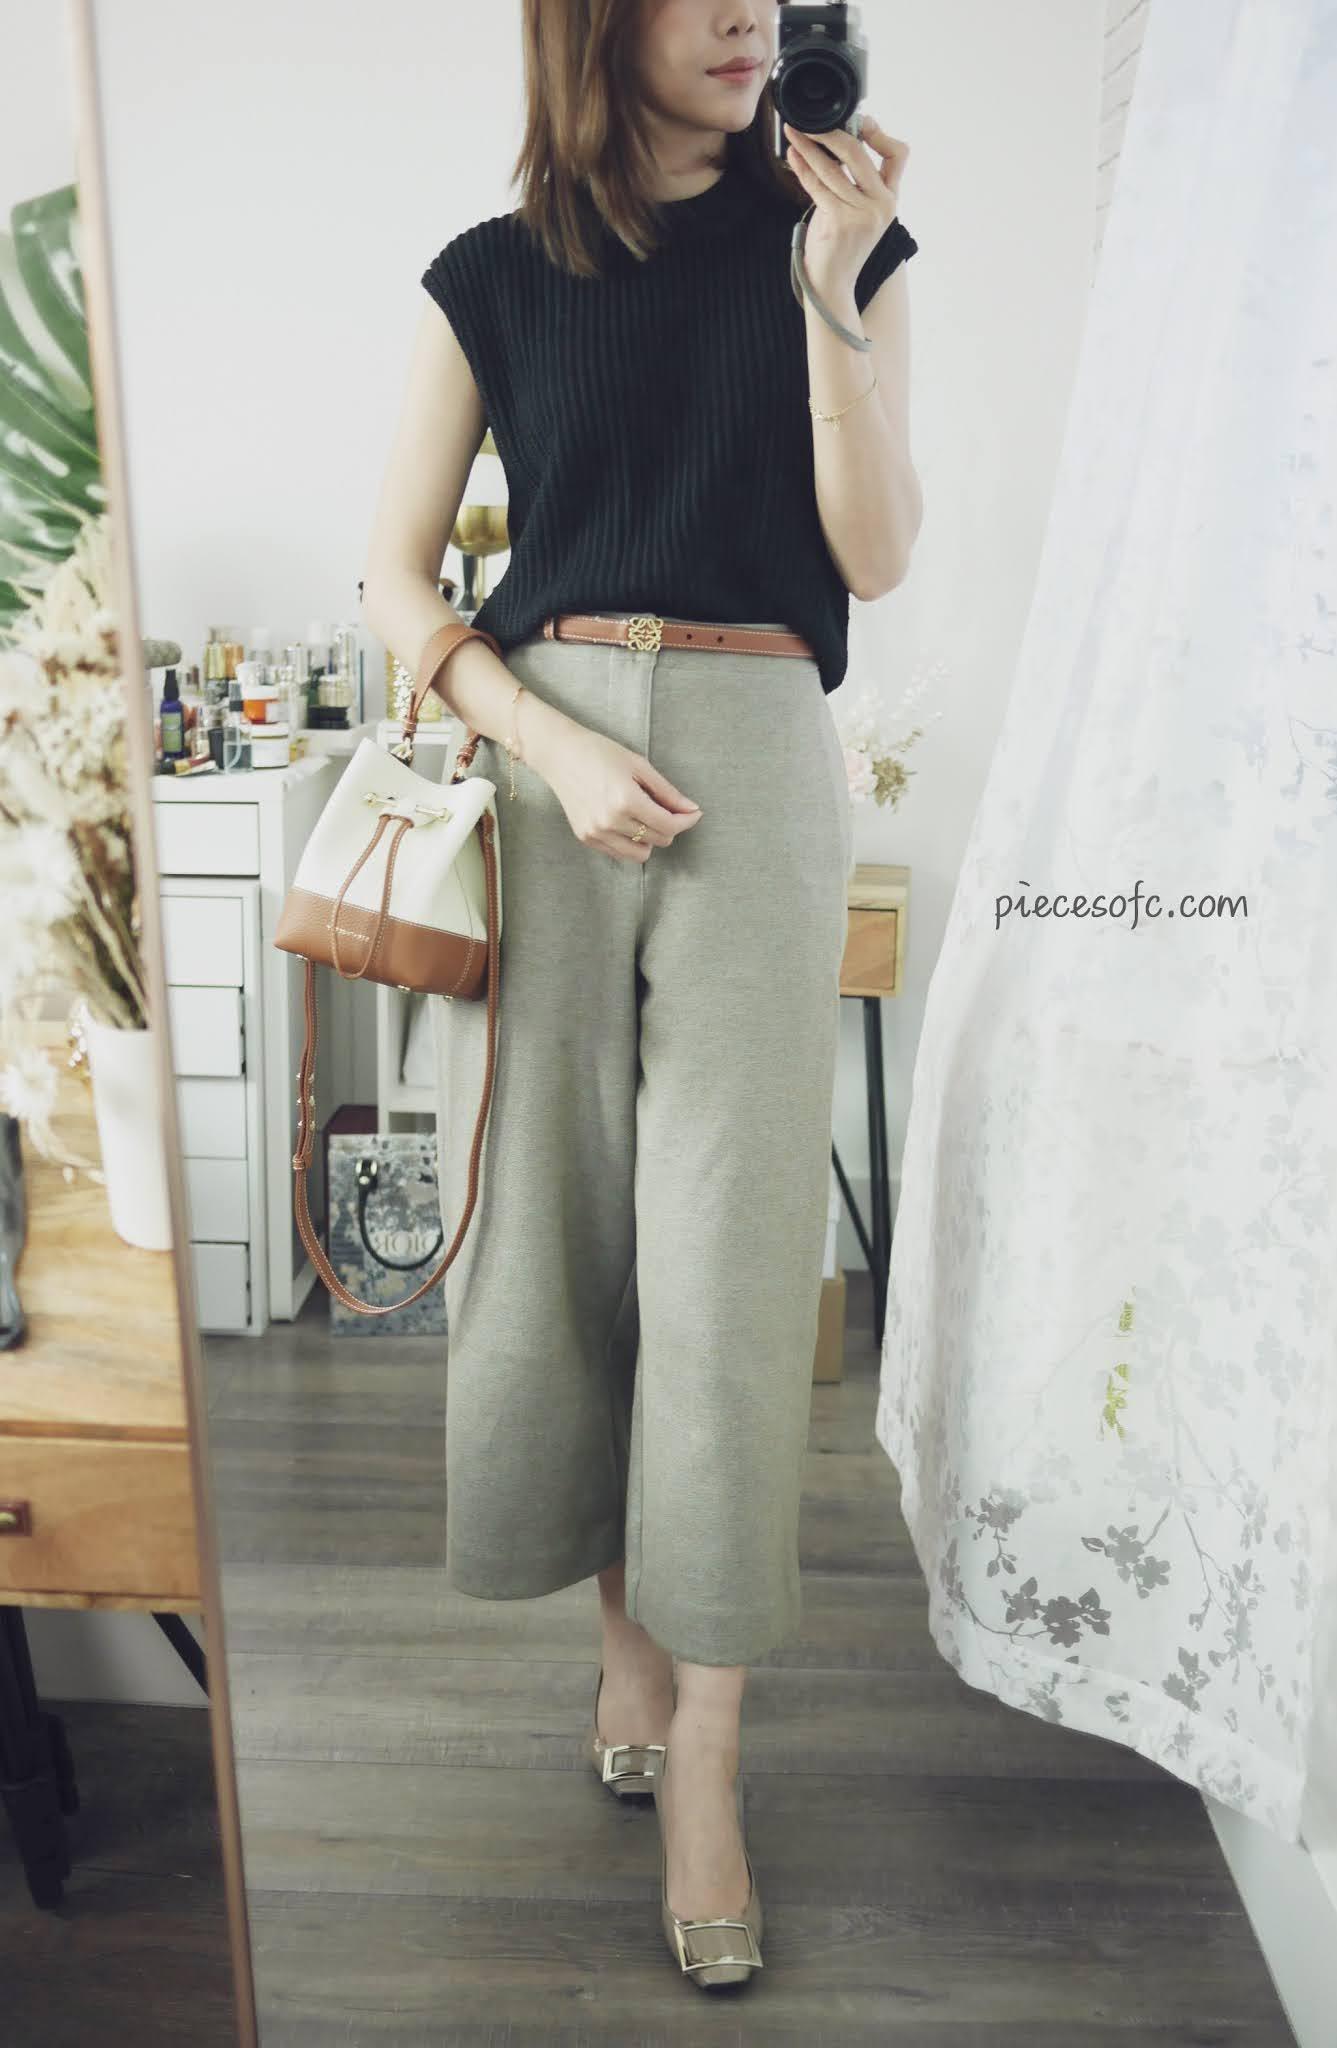 Strathberry-Loewe-belt-Uniqlo-皮帶